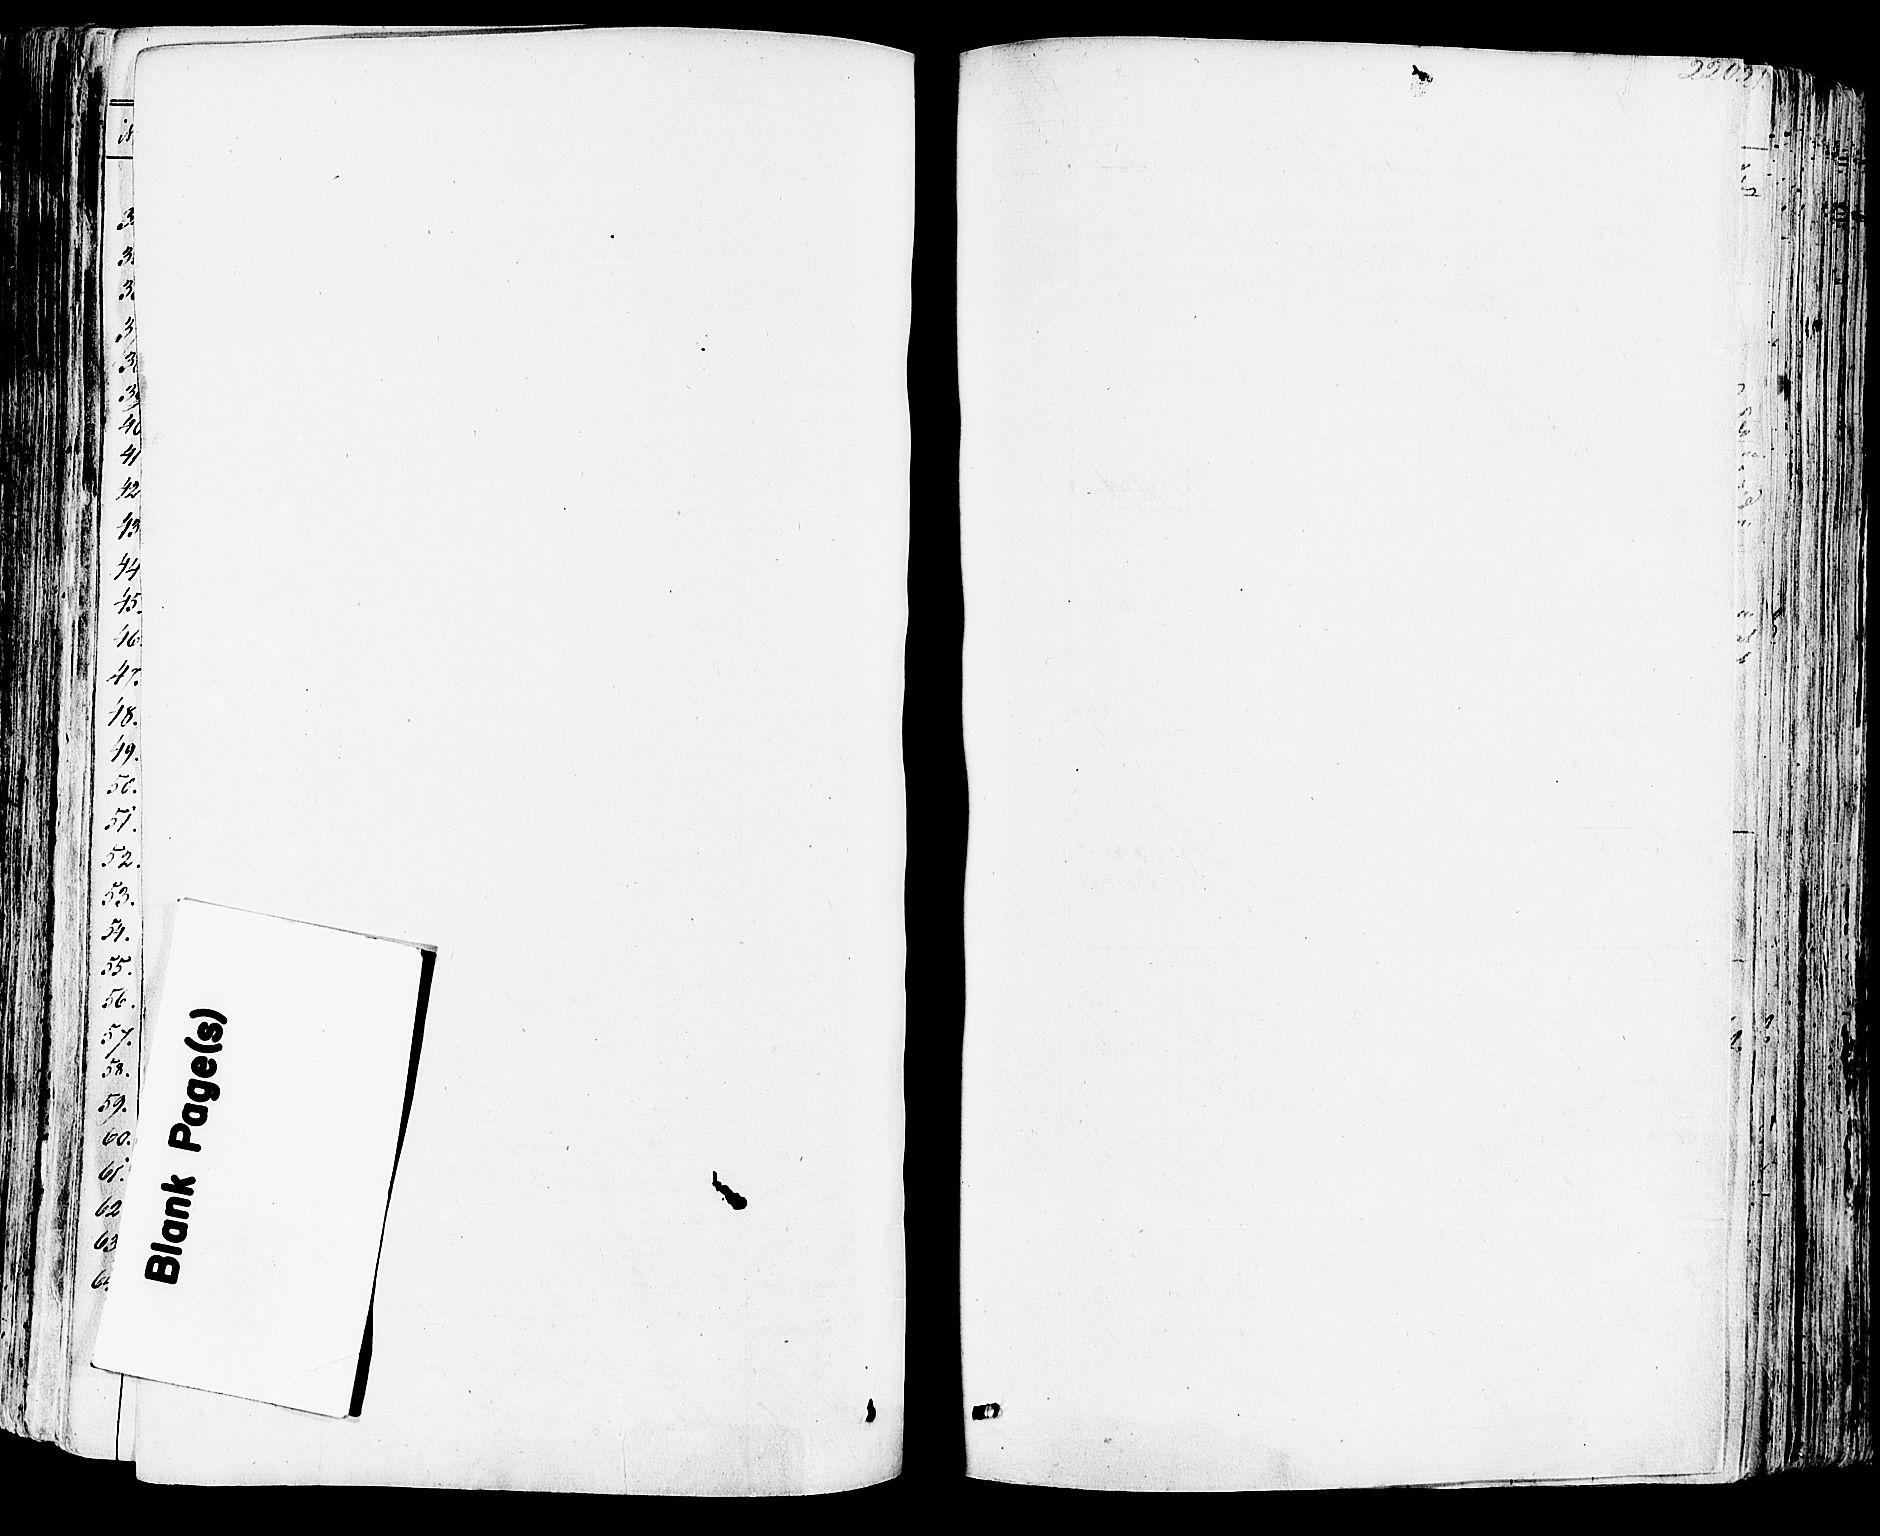 SAKO, Sauherad kirkebøker, F/Fa/L0006: Ministerialbok nr. I 6, 1827-1850, s. 220